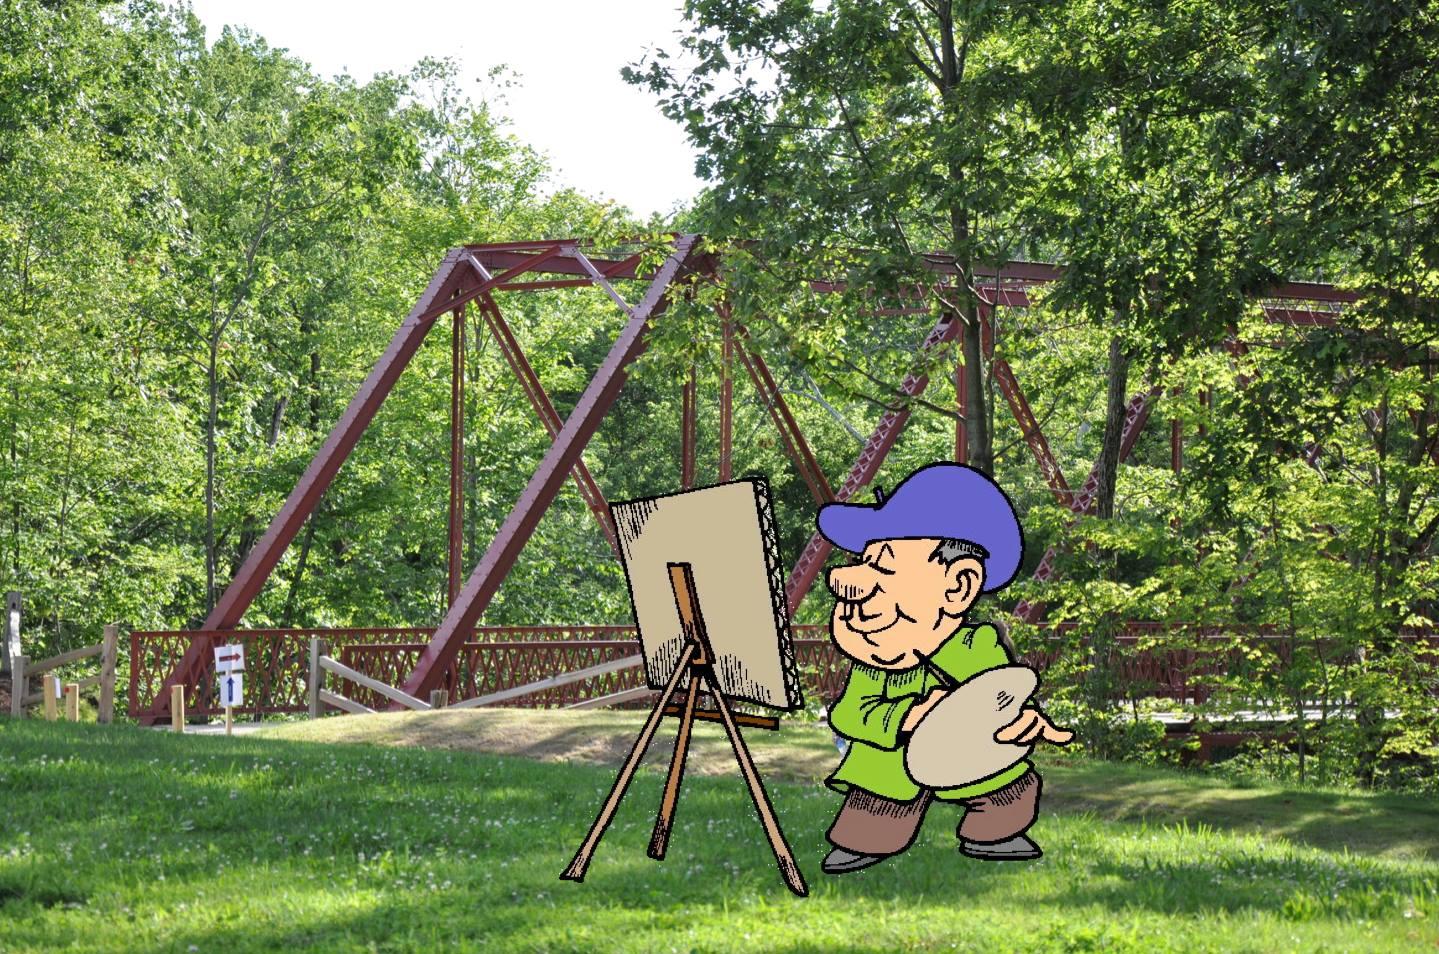 Indiana hendricks county lizton - Plein Air Painting